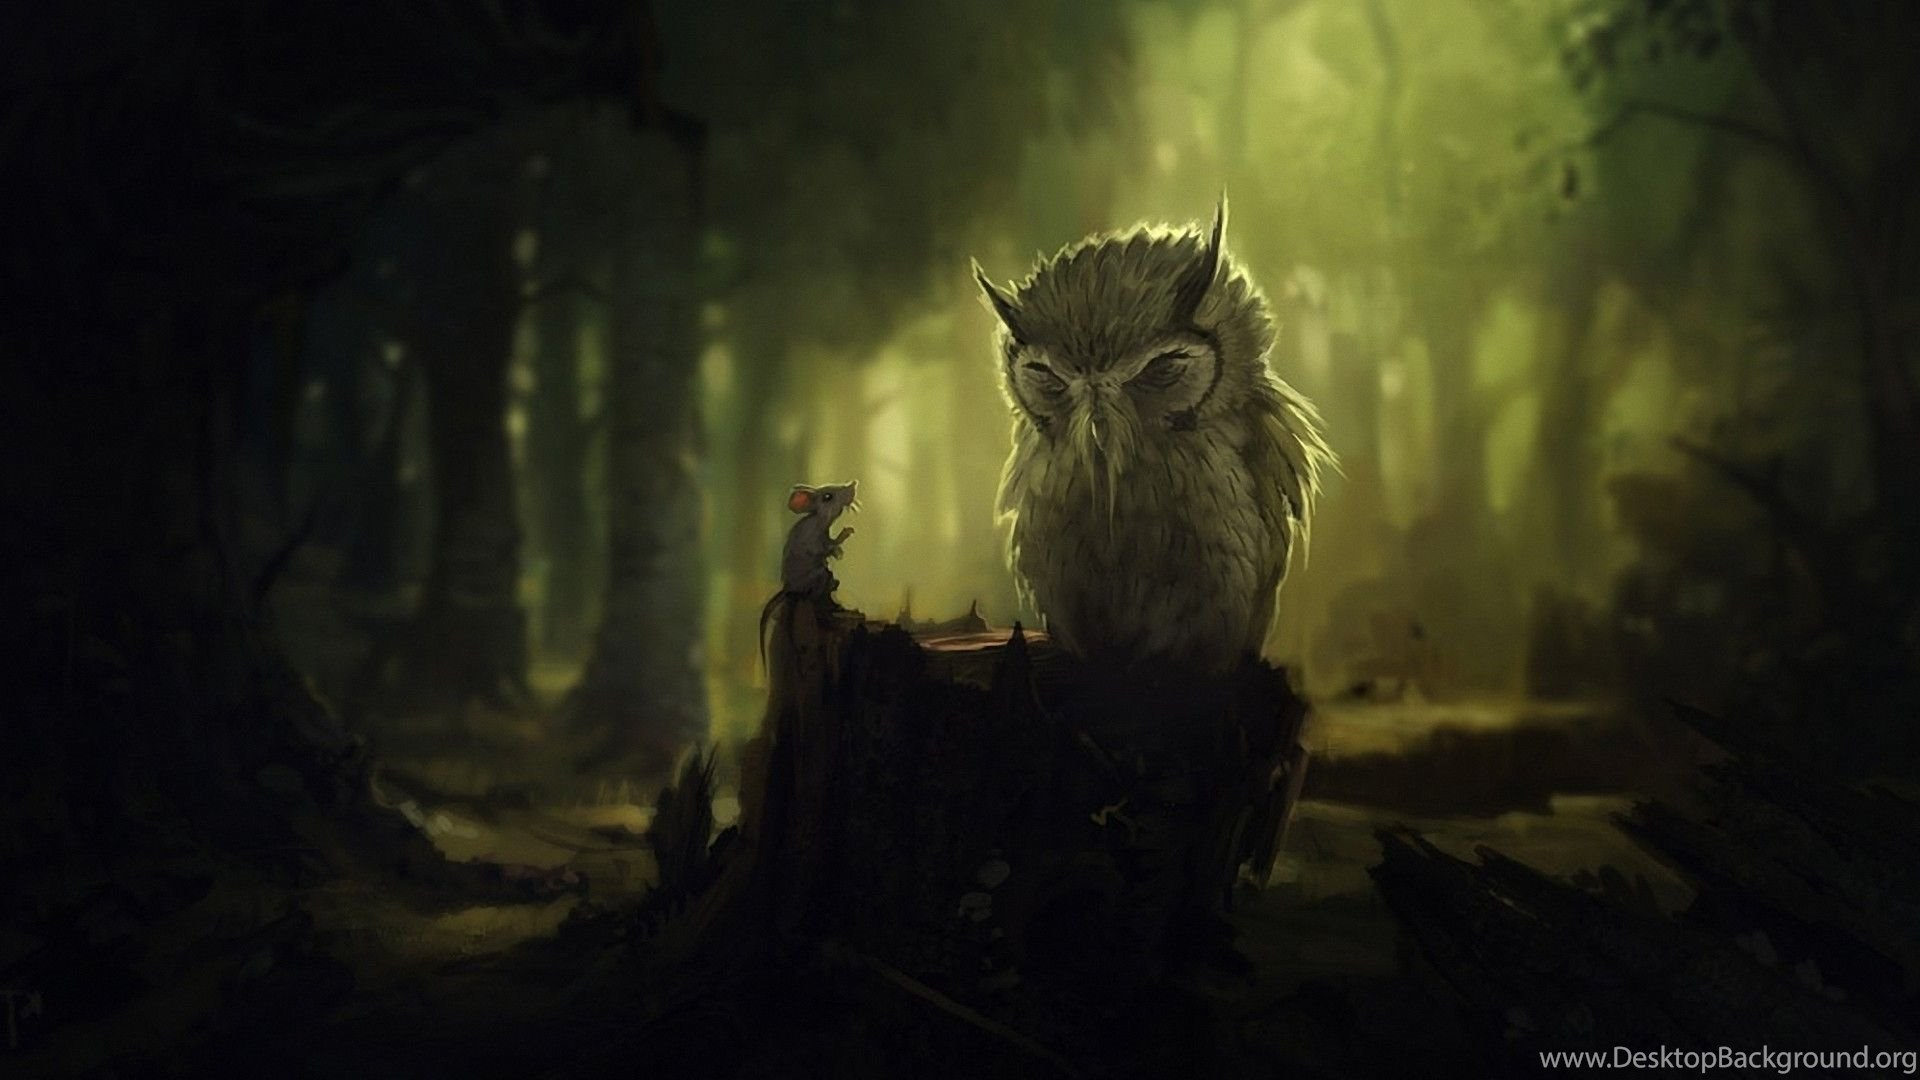 Anime, Nature, Artwork, Owl, Digital Art, Animals, Birds, Forest ...